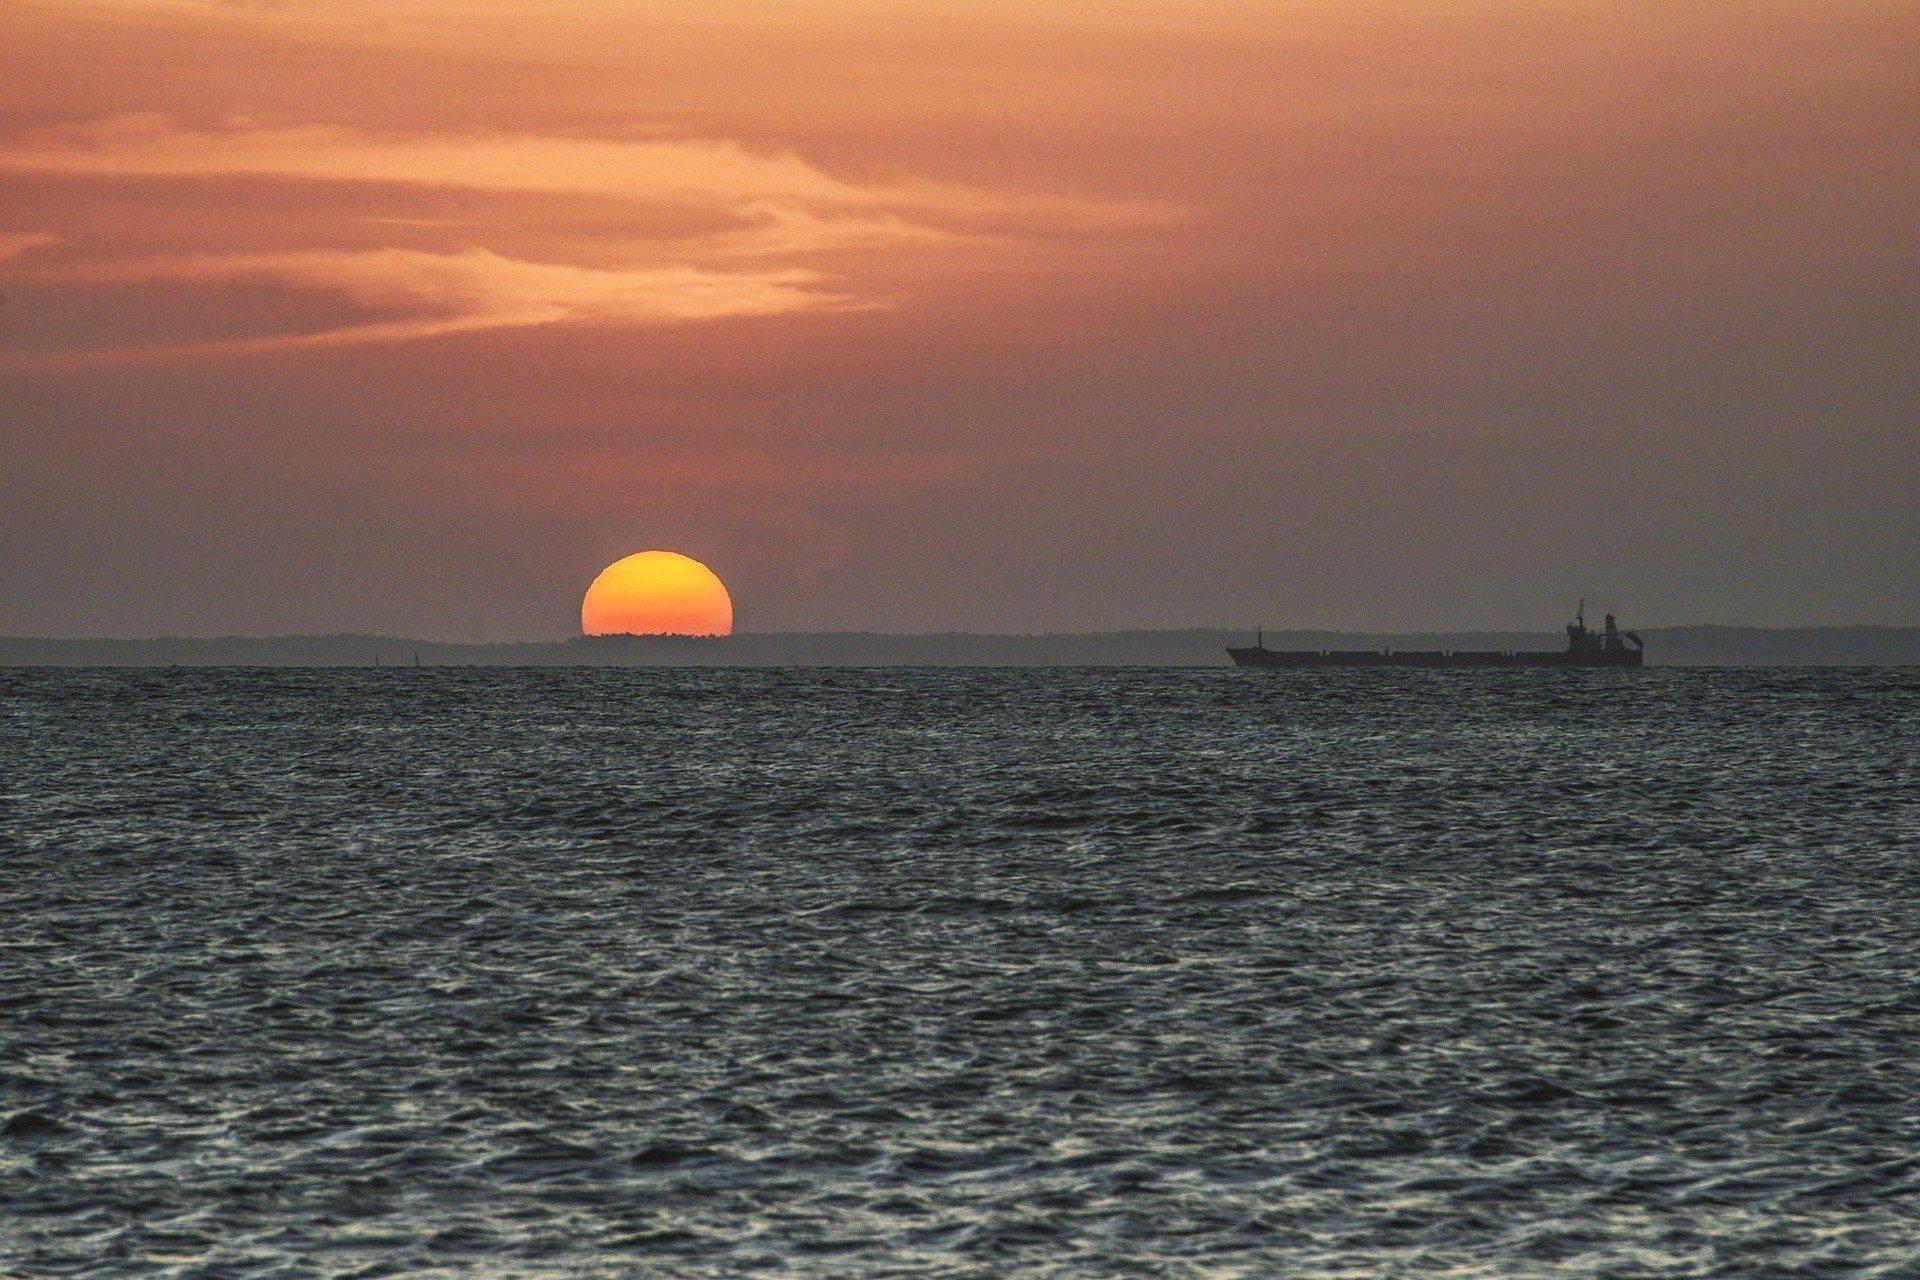 У побережья Нигерии захвачено судно с украинцами